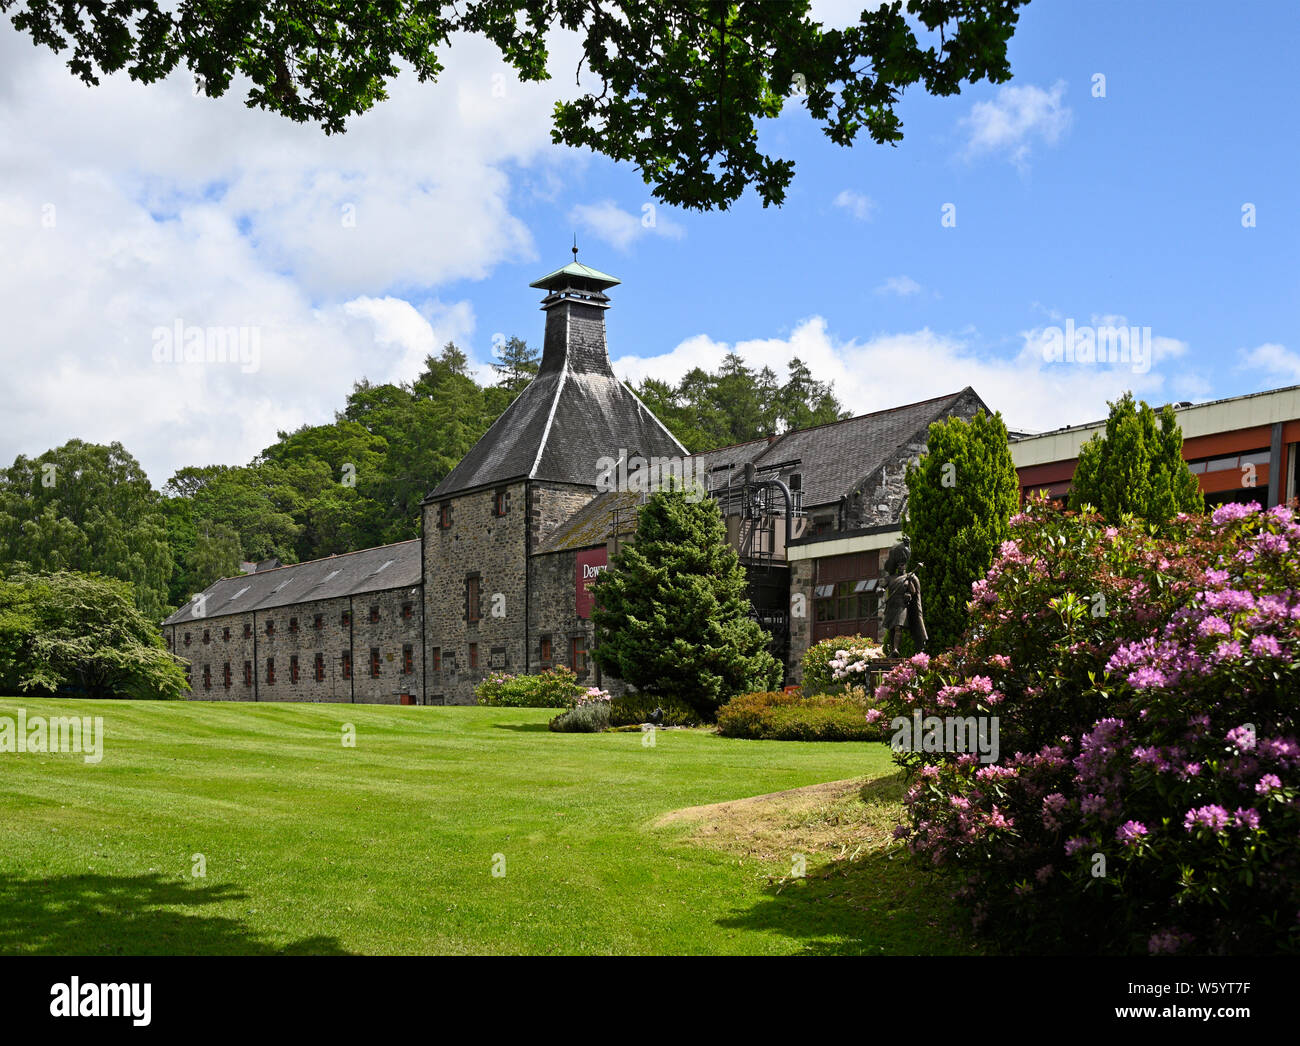 dewars-aberfeldy-whisky-distillery-aberfeldy-perth-and-kinross-scotland-united-kingdom-europe-W5YT7F.jpg